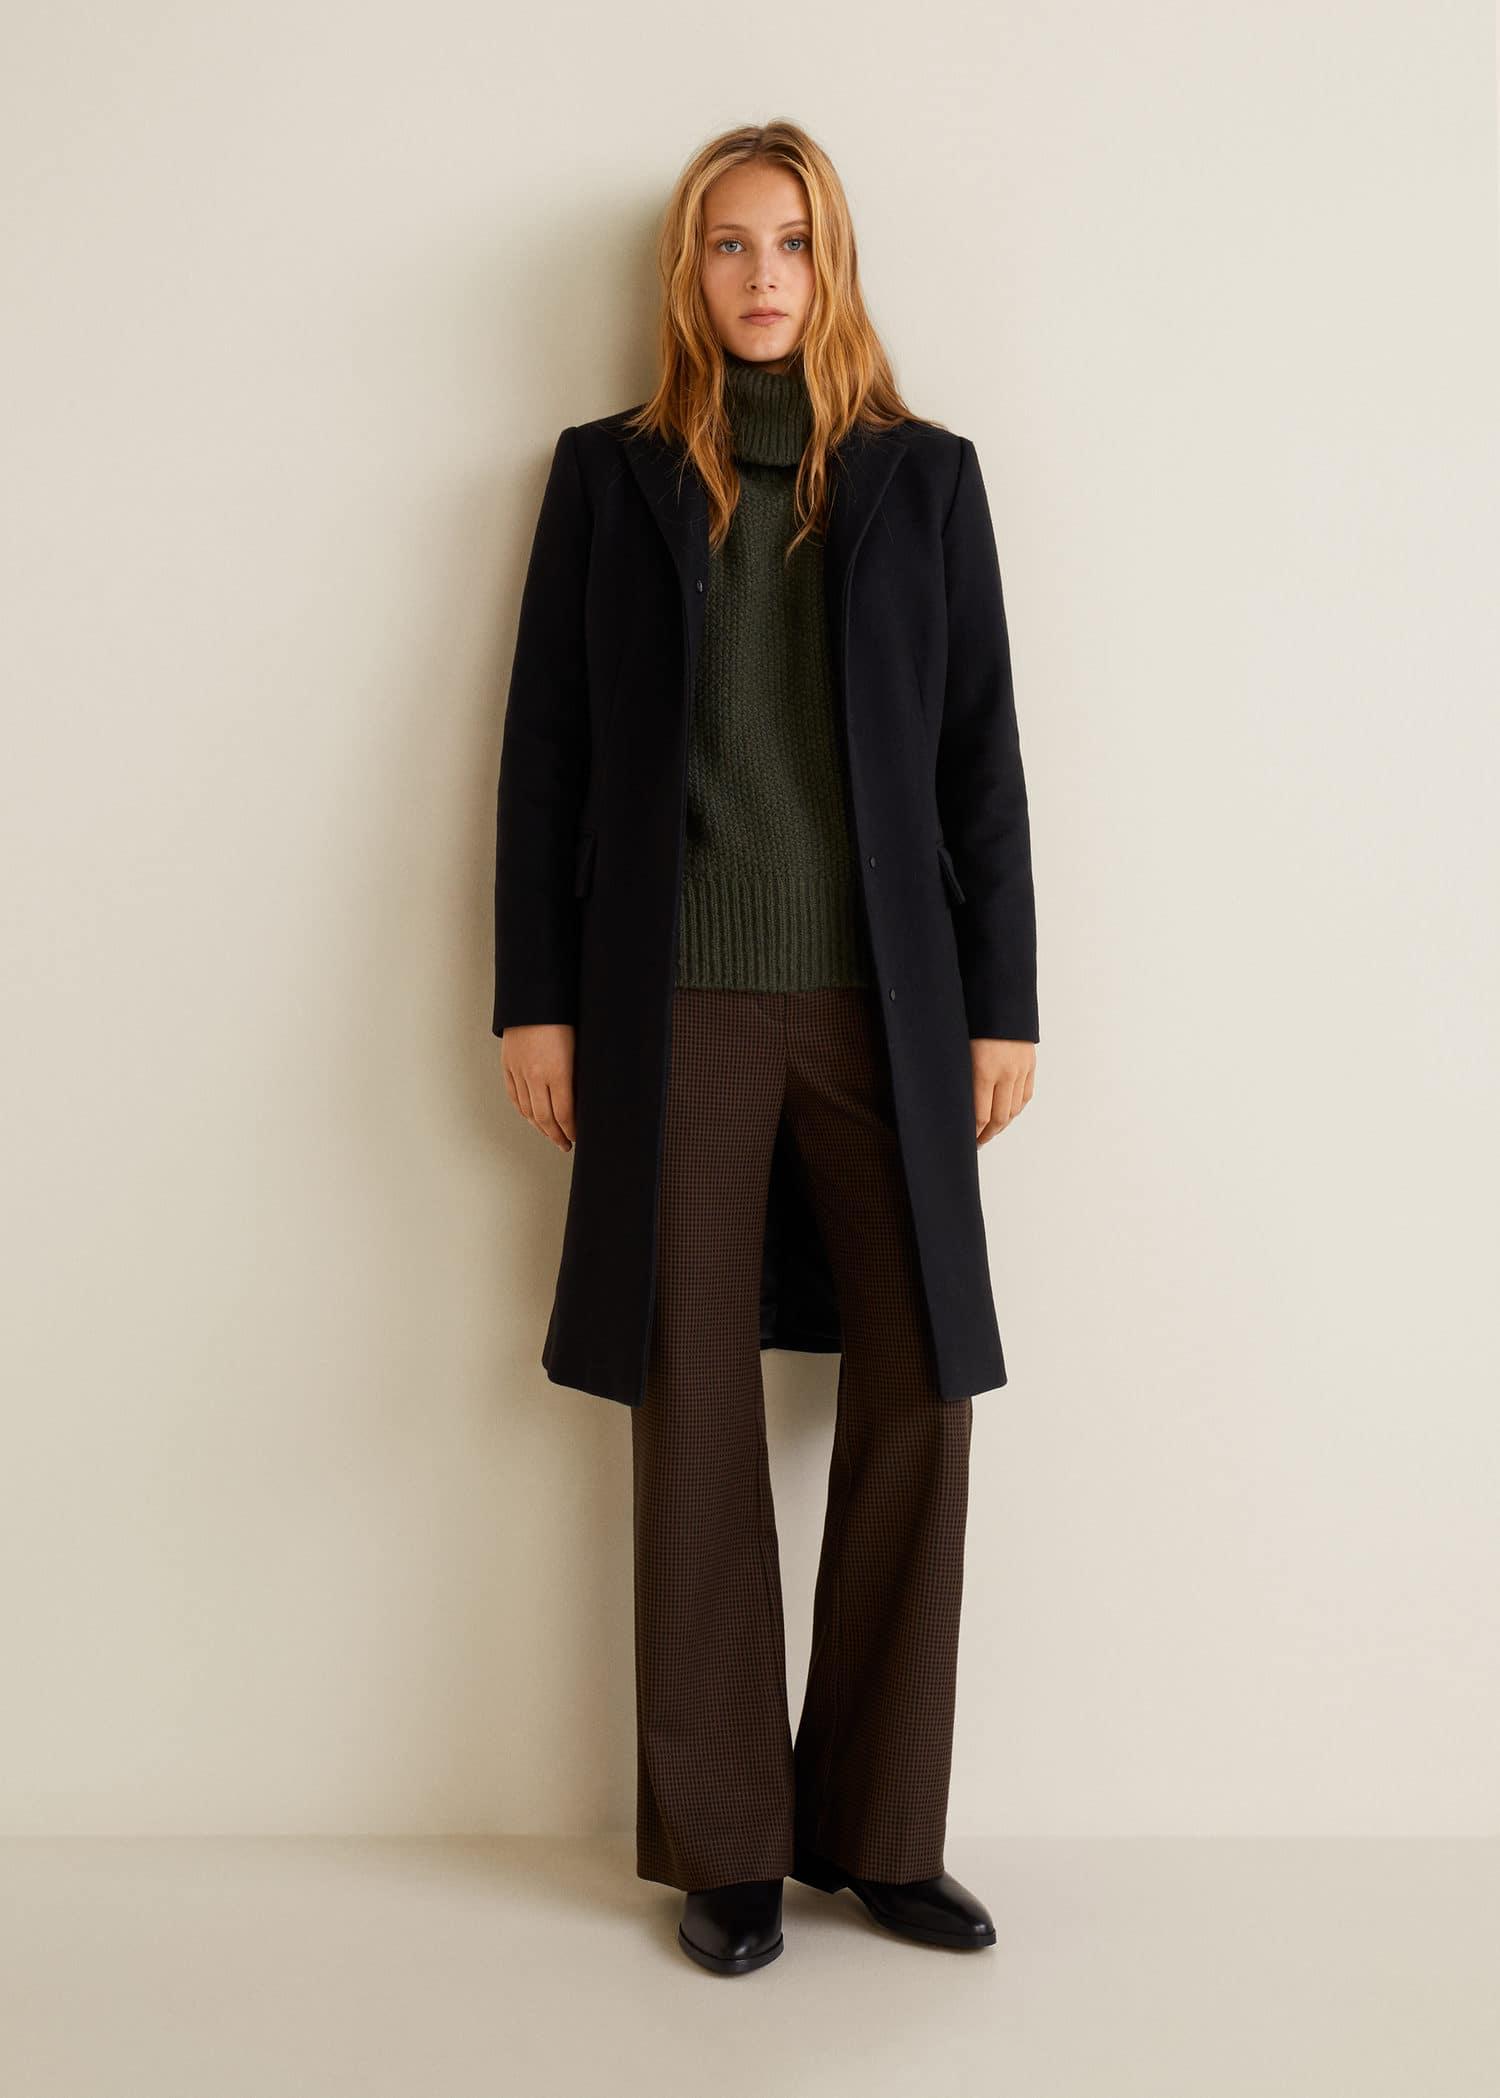 lindos zapatos Tienda vista previa de Abrigo lana estructurado - Mujer | Mango España